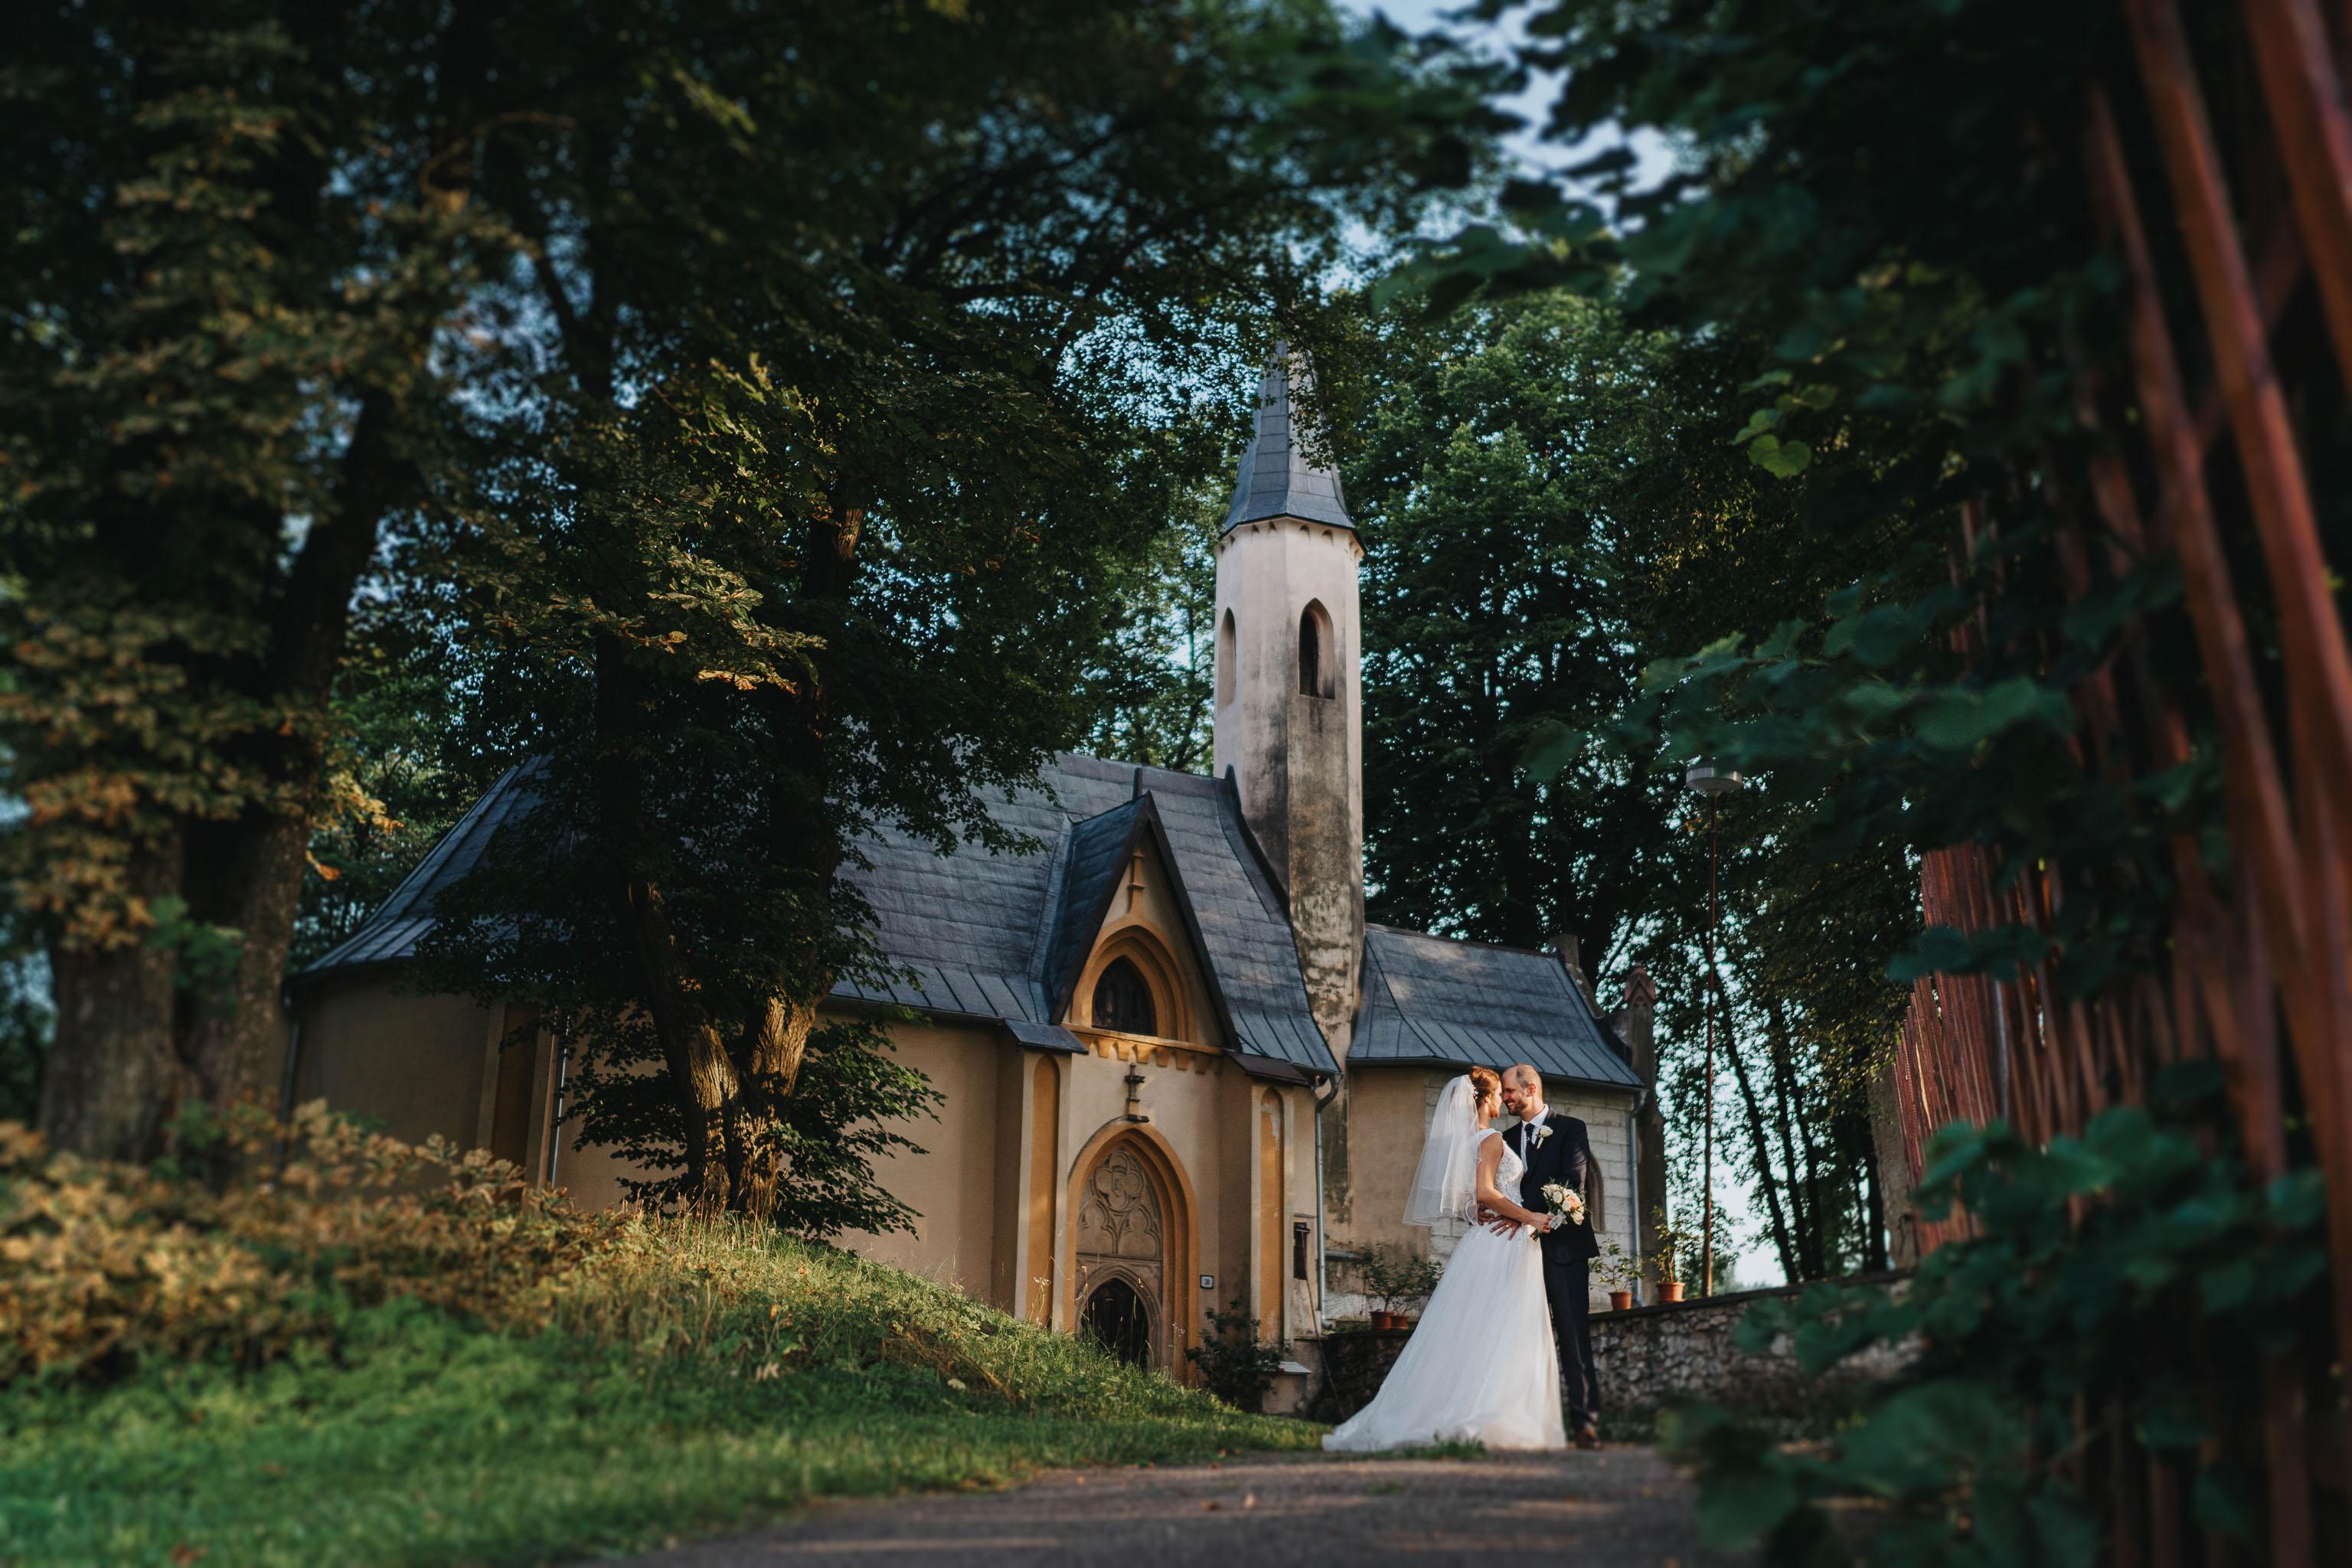 svadobný fotograf humenne